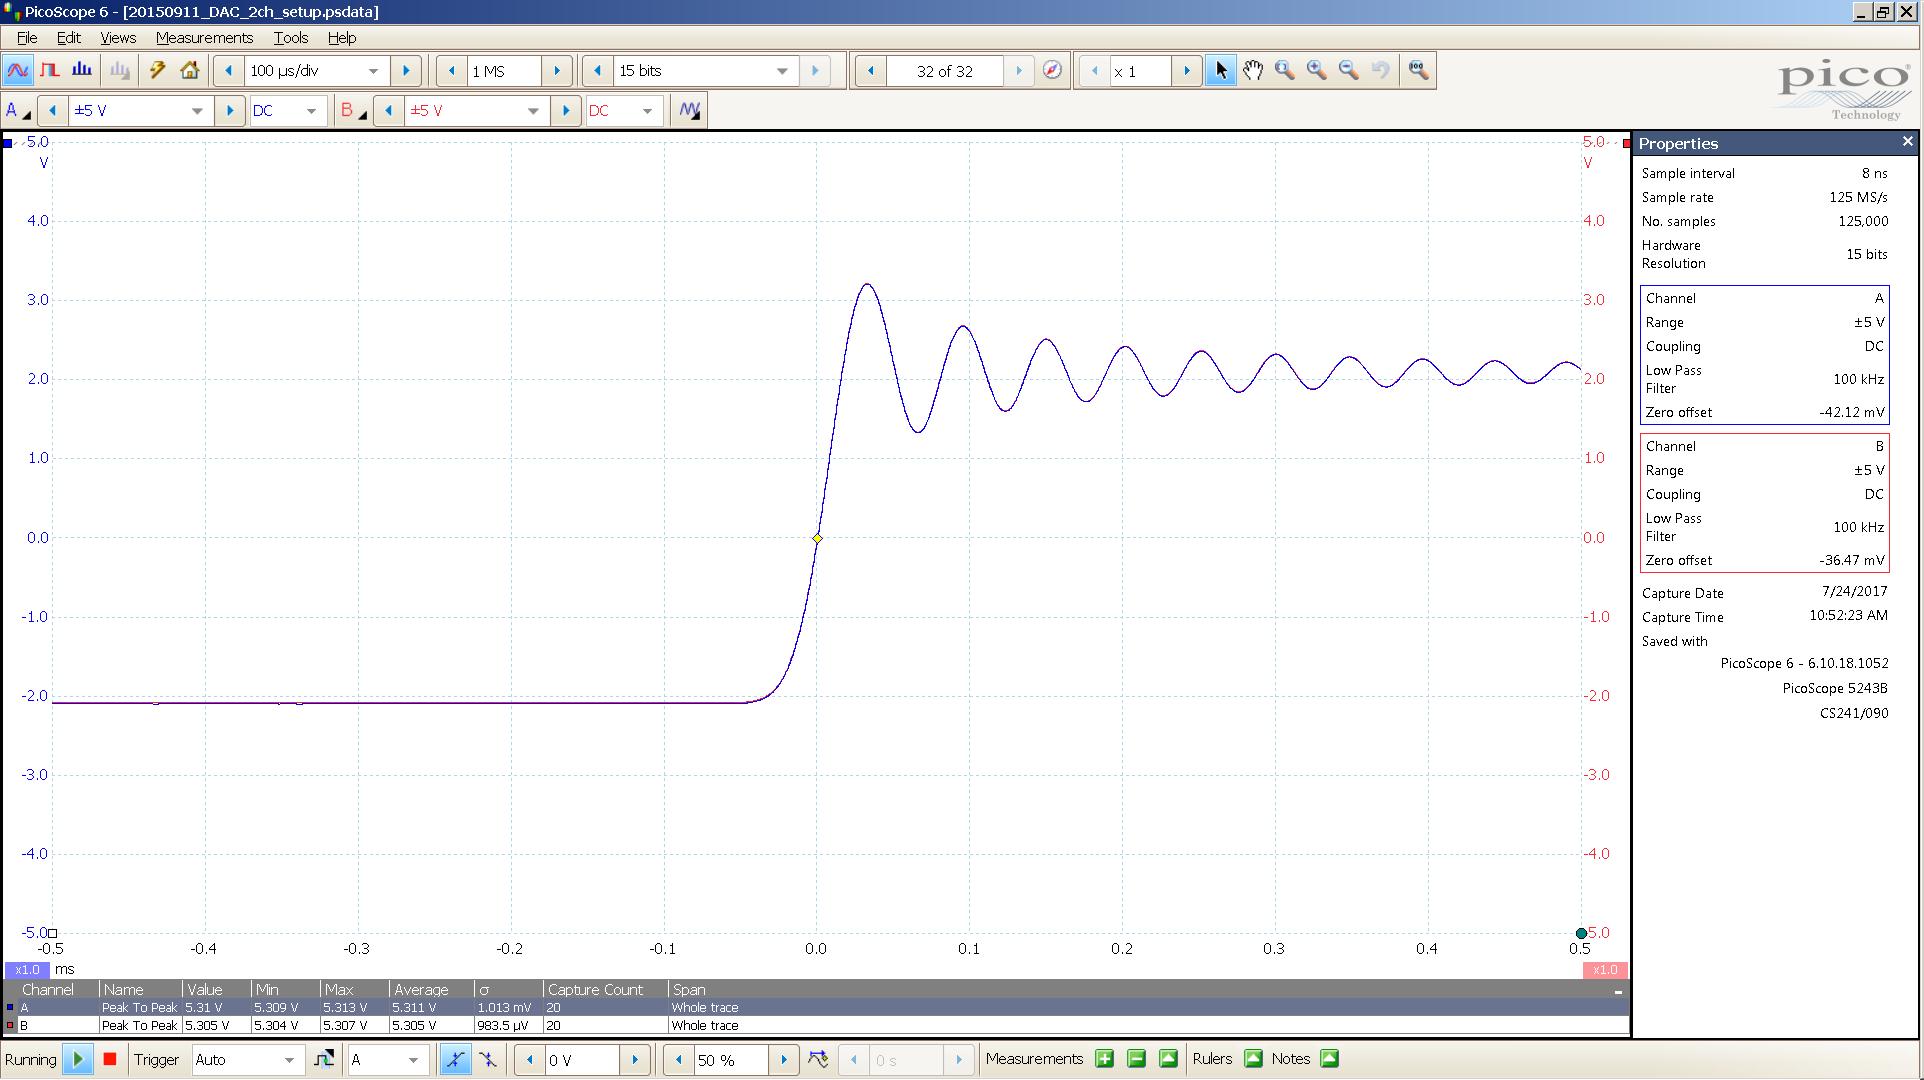 20170724 Ares SE 20 Hz sqr -4 dBFS 4_2 Vpp 100uS div.PNG